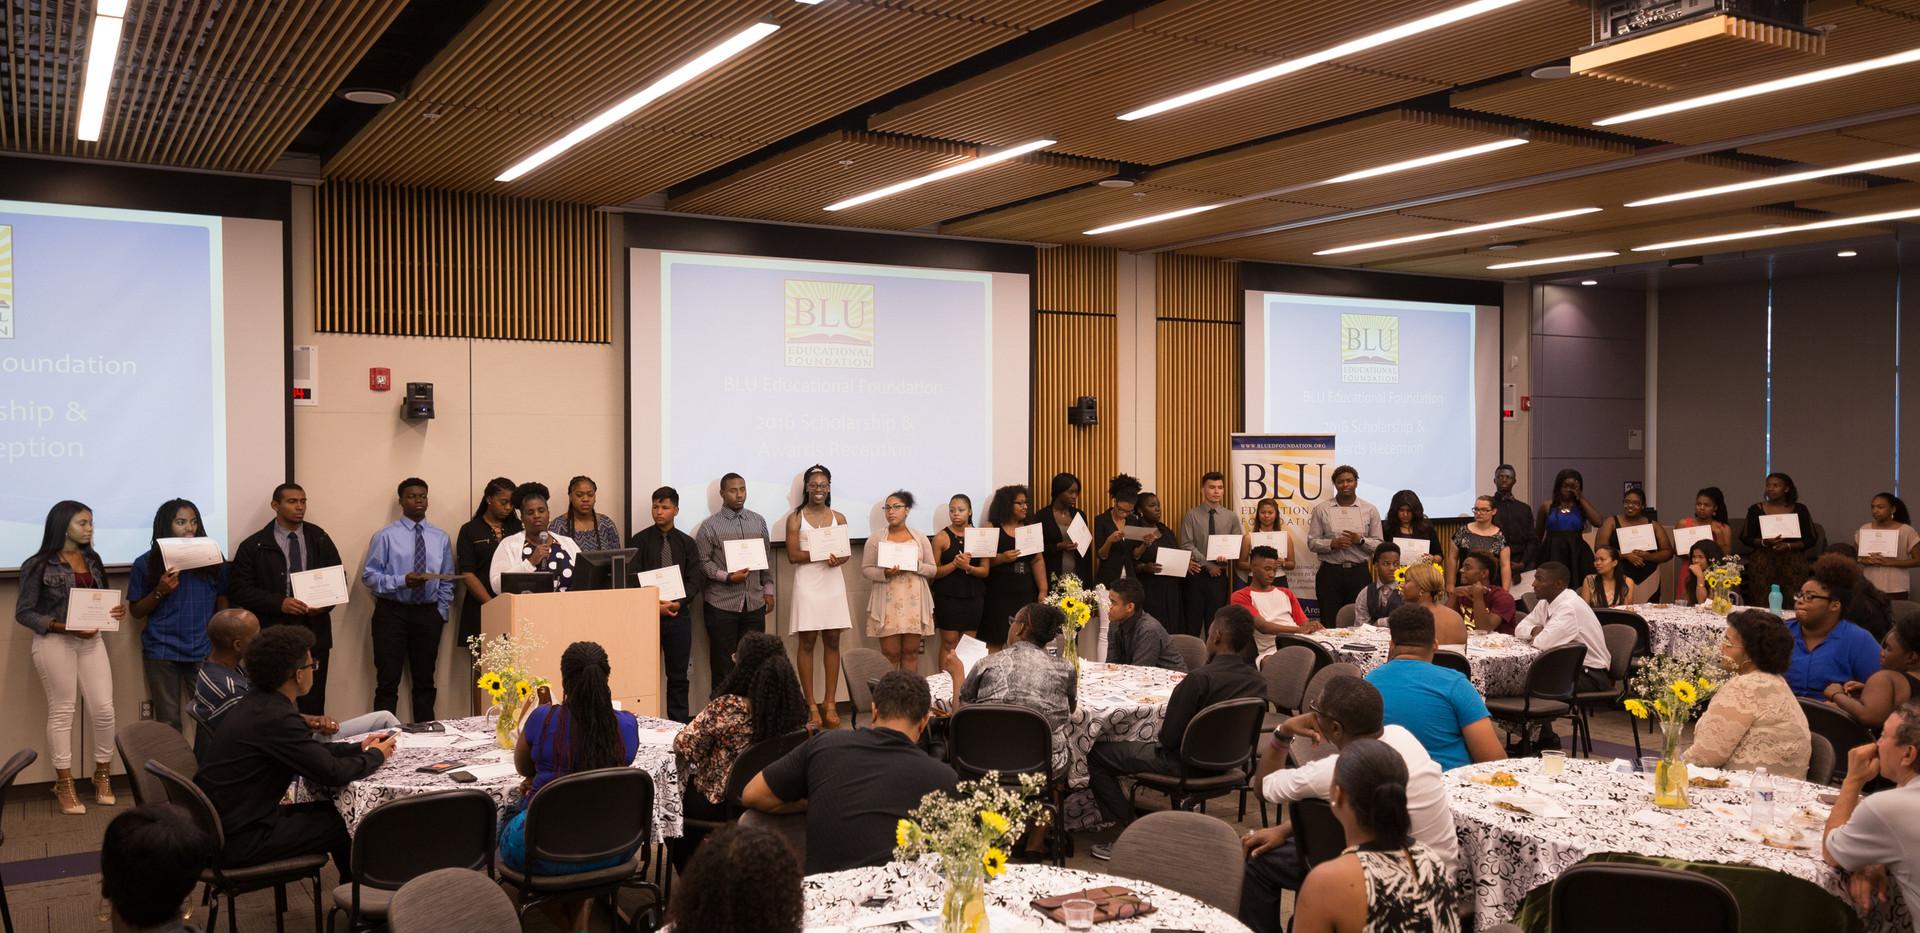 6-9-2016 Blu Education Award Ceremony-98